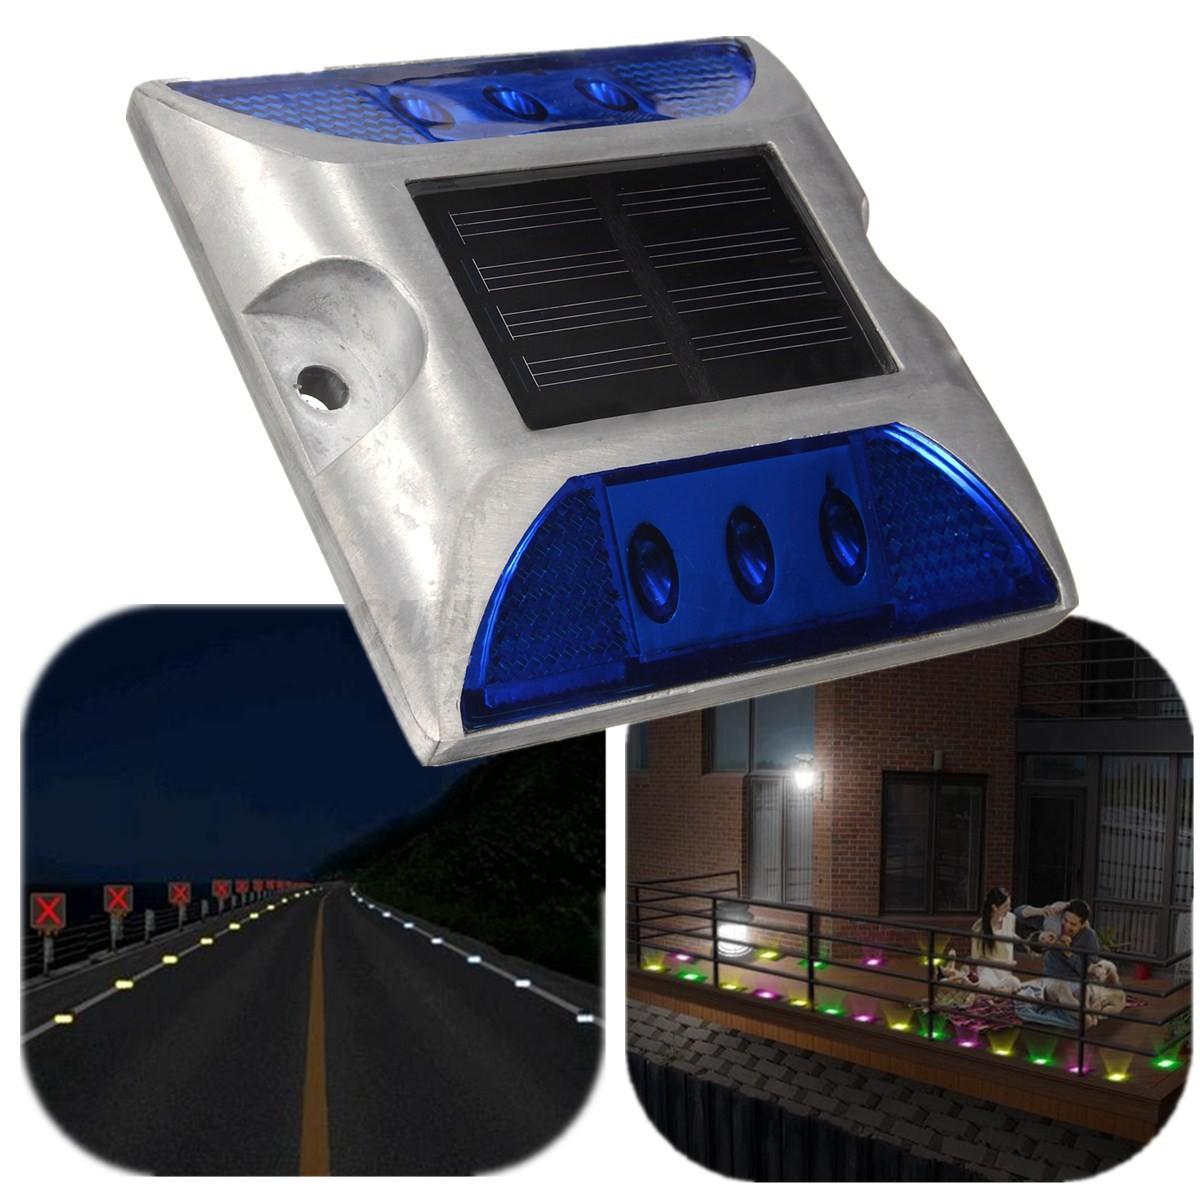 6 led aluminum wand solar lampe garten bodenstrahler treppen au en leuchte licht ebay. Black Bedroom Furniture Sets. Home Design Ideas